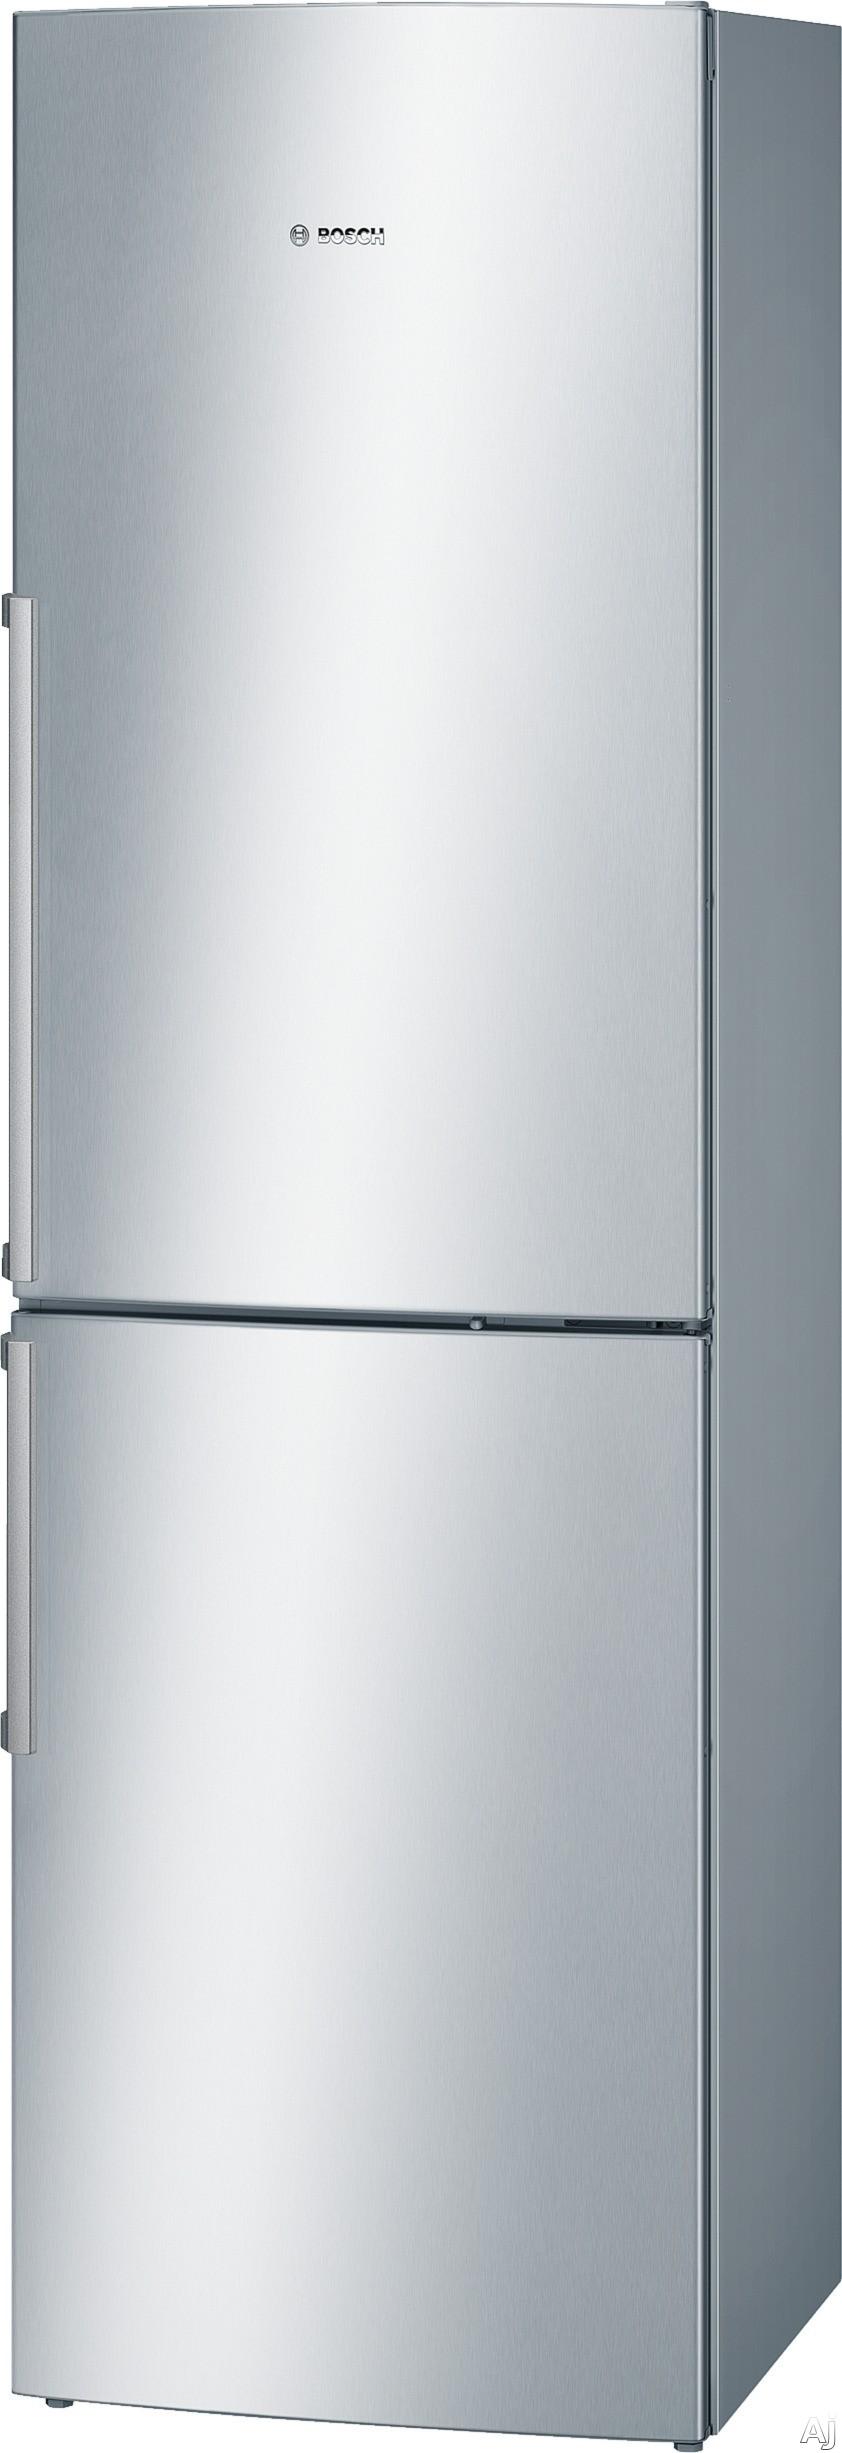 Bosch 500 Series B11CB81SSS 24 Inch Bottom Freezer Refrigerator with 2 Adjustable Glass Shelves, 3 Door Bins, 1 HydroFresh Crisper Drawer, 2 Wire Freezer Shelves, ENERGY STAR and Ice Maker